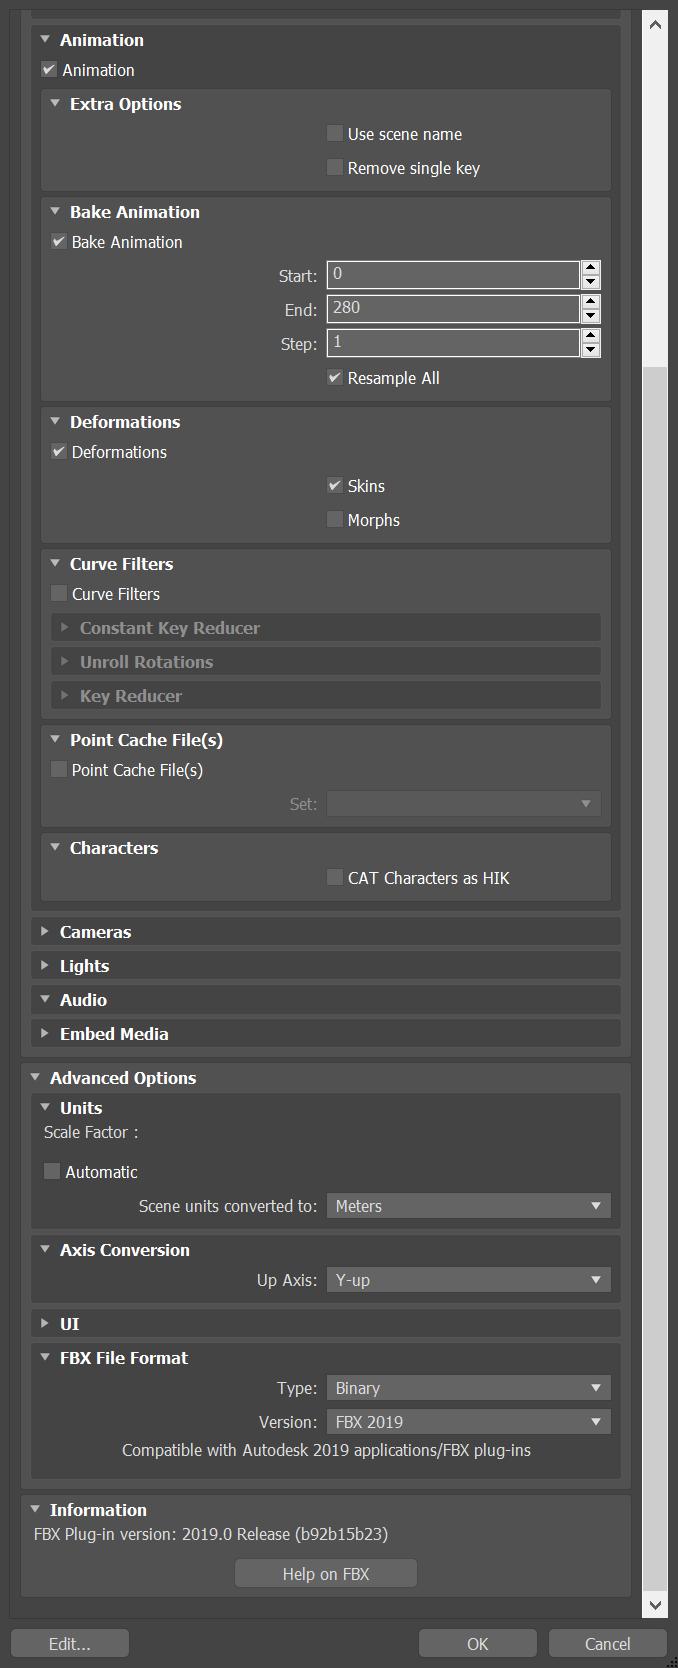 PillarDesignC_Basemodel1.max - Autodesk 3ds Max 2019  14.06.2019 13_44_00.png